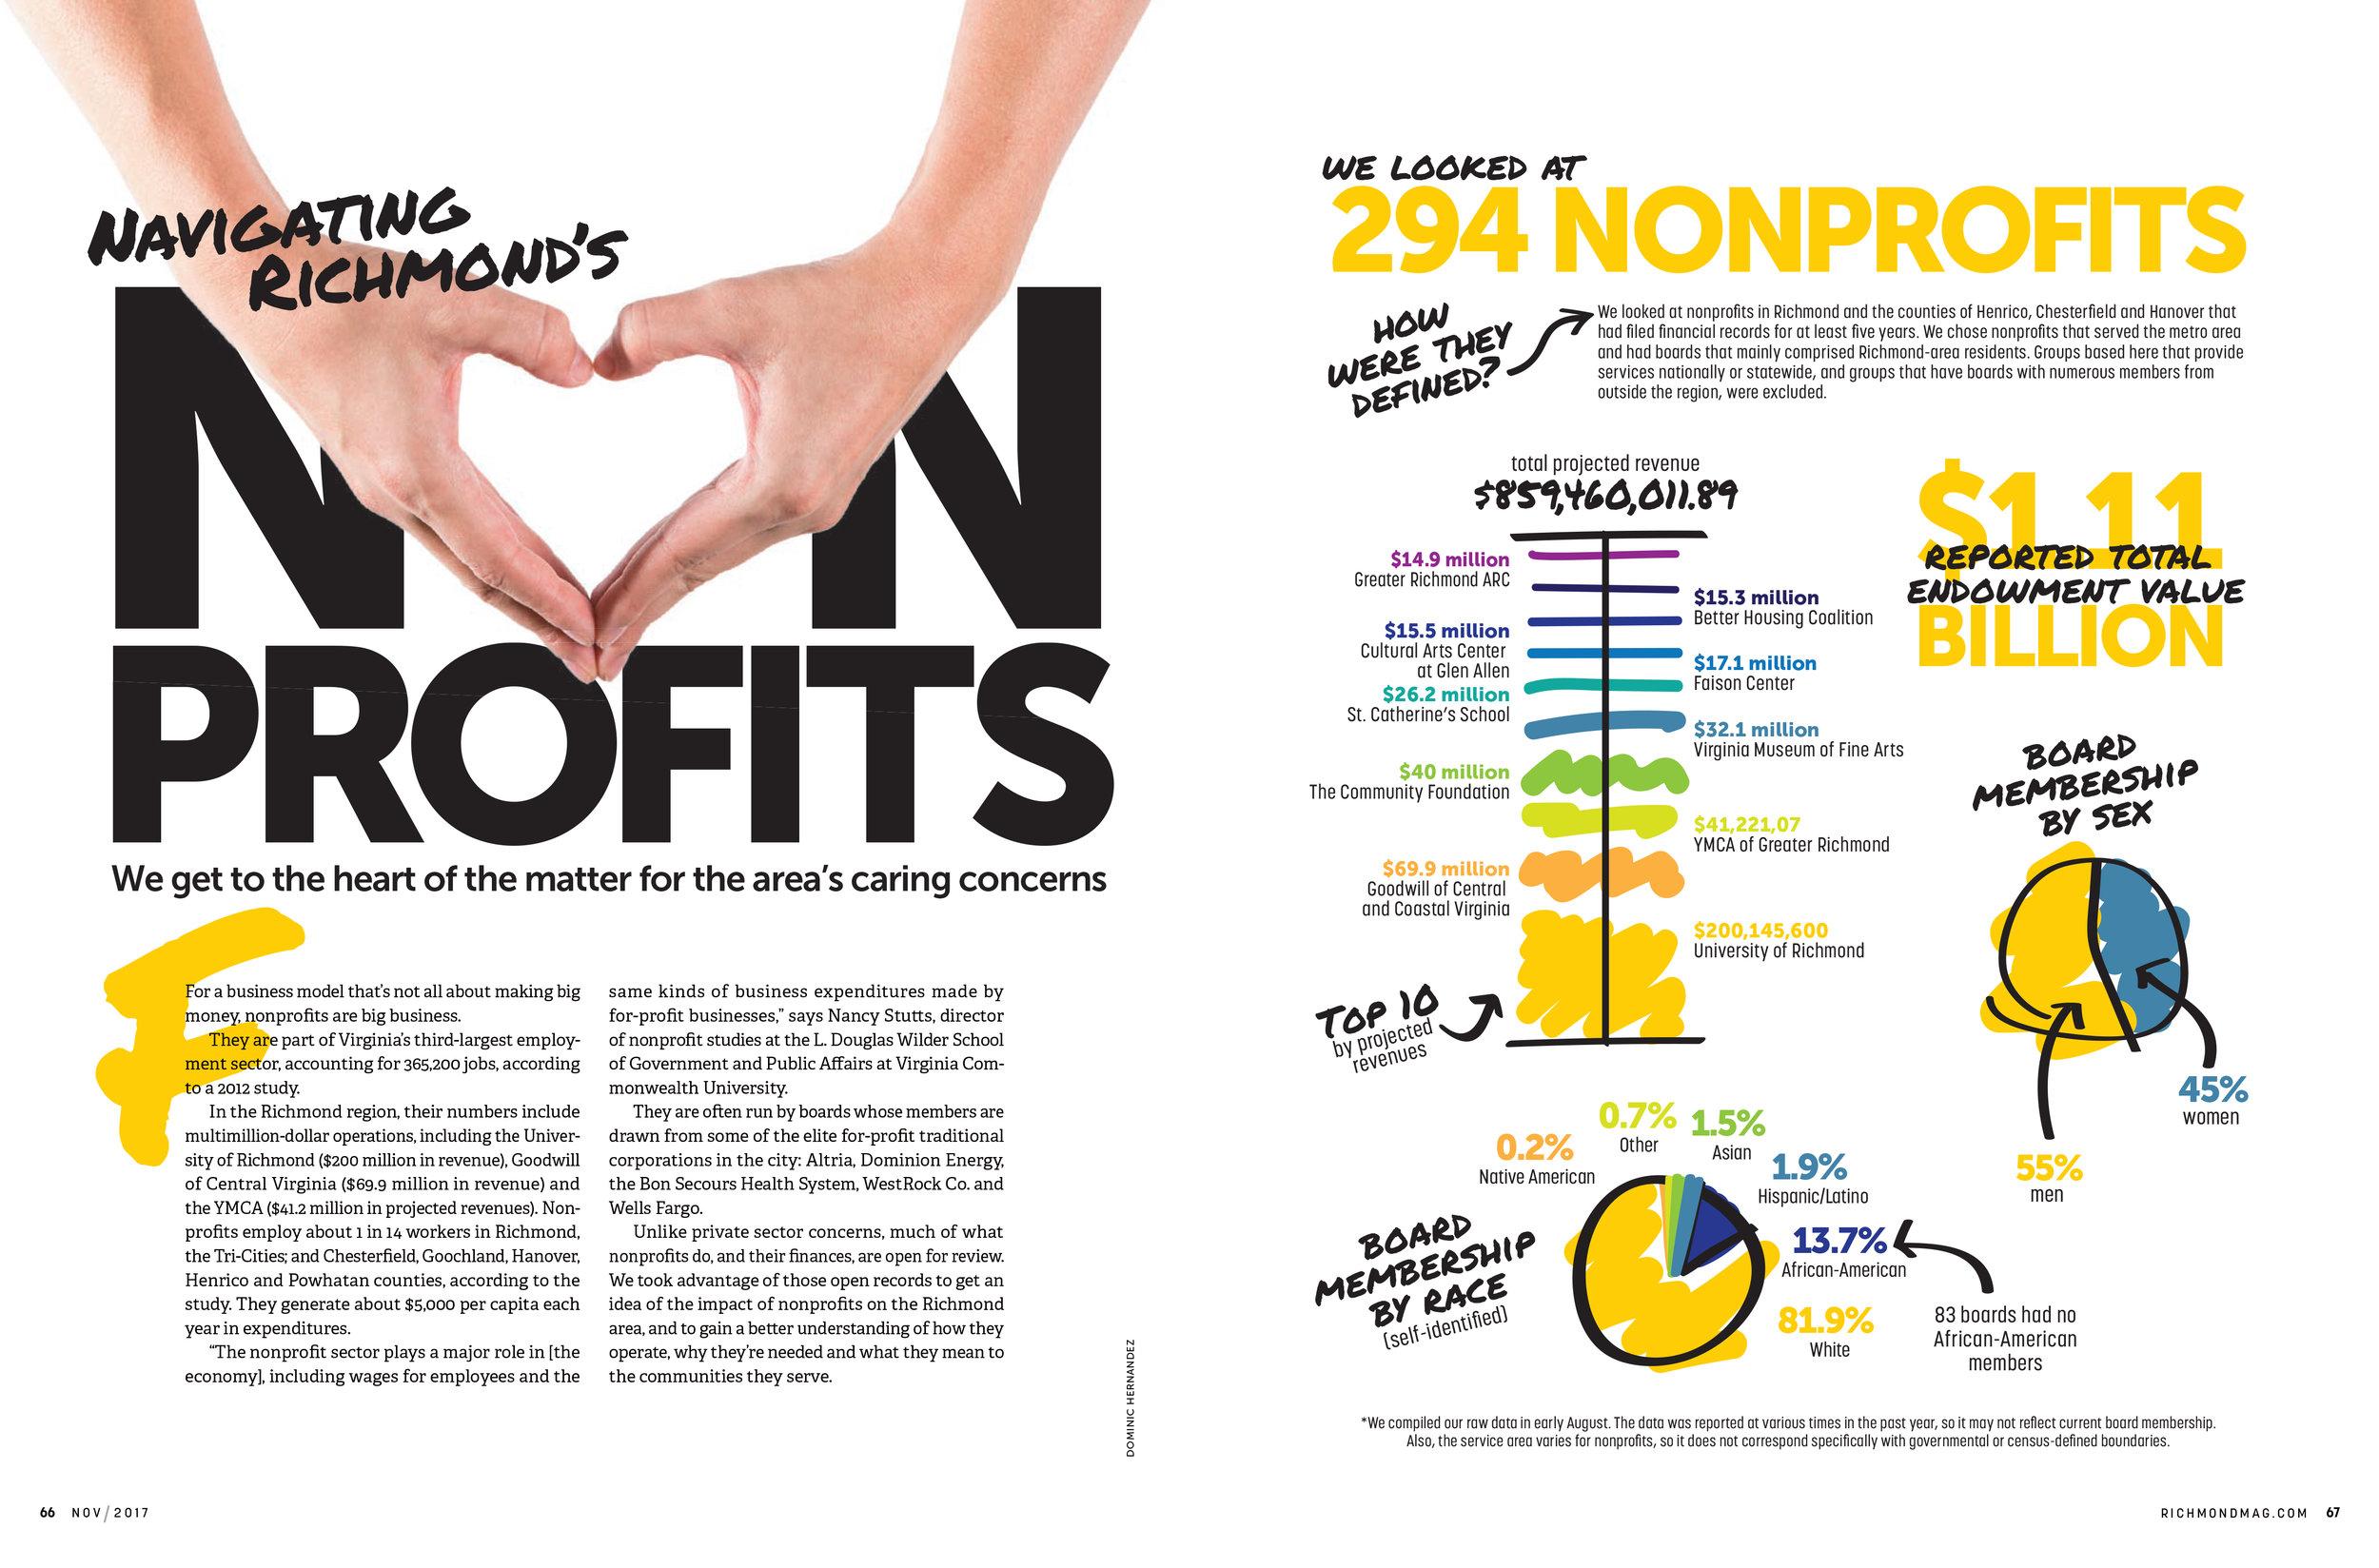 1117Nonprofits.jpg